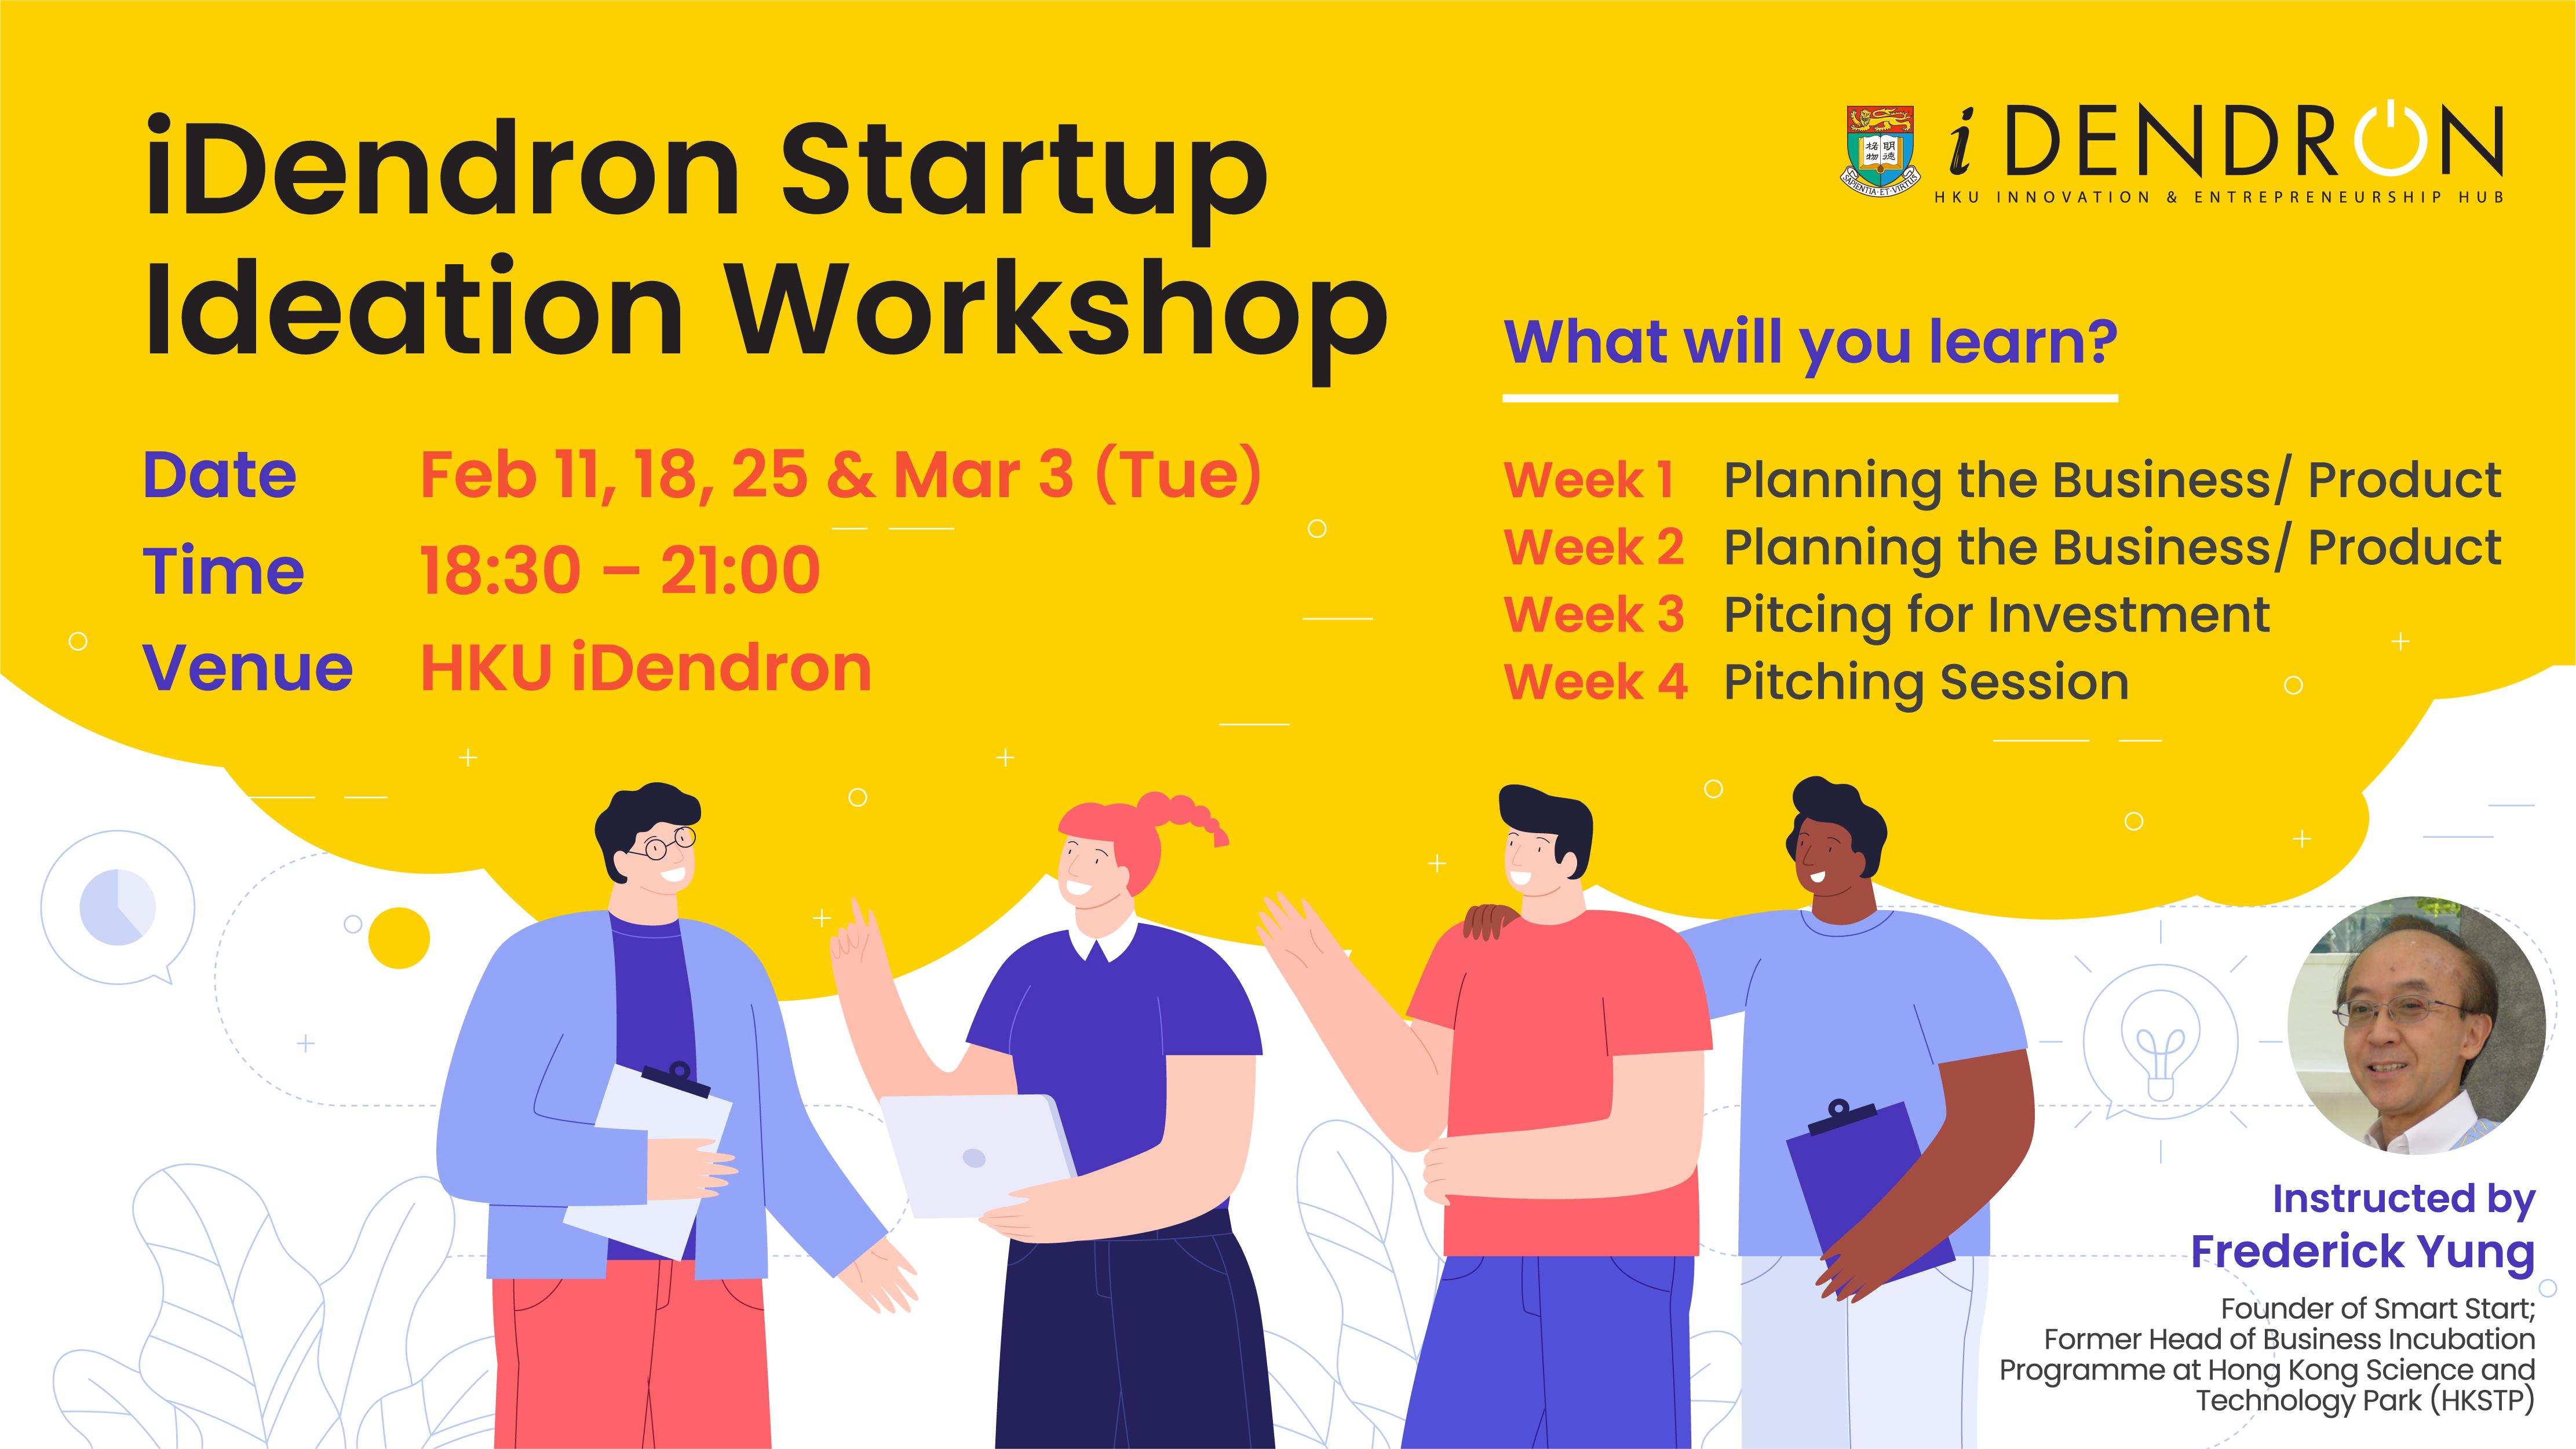 iDendron Startup Ideation Workshop